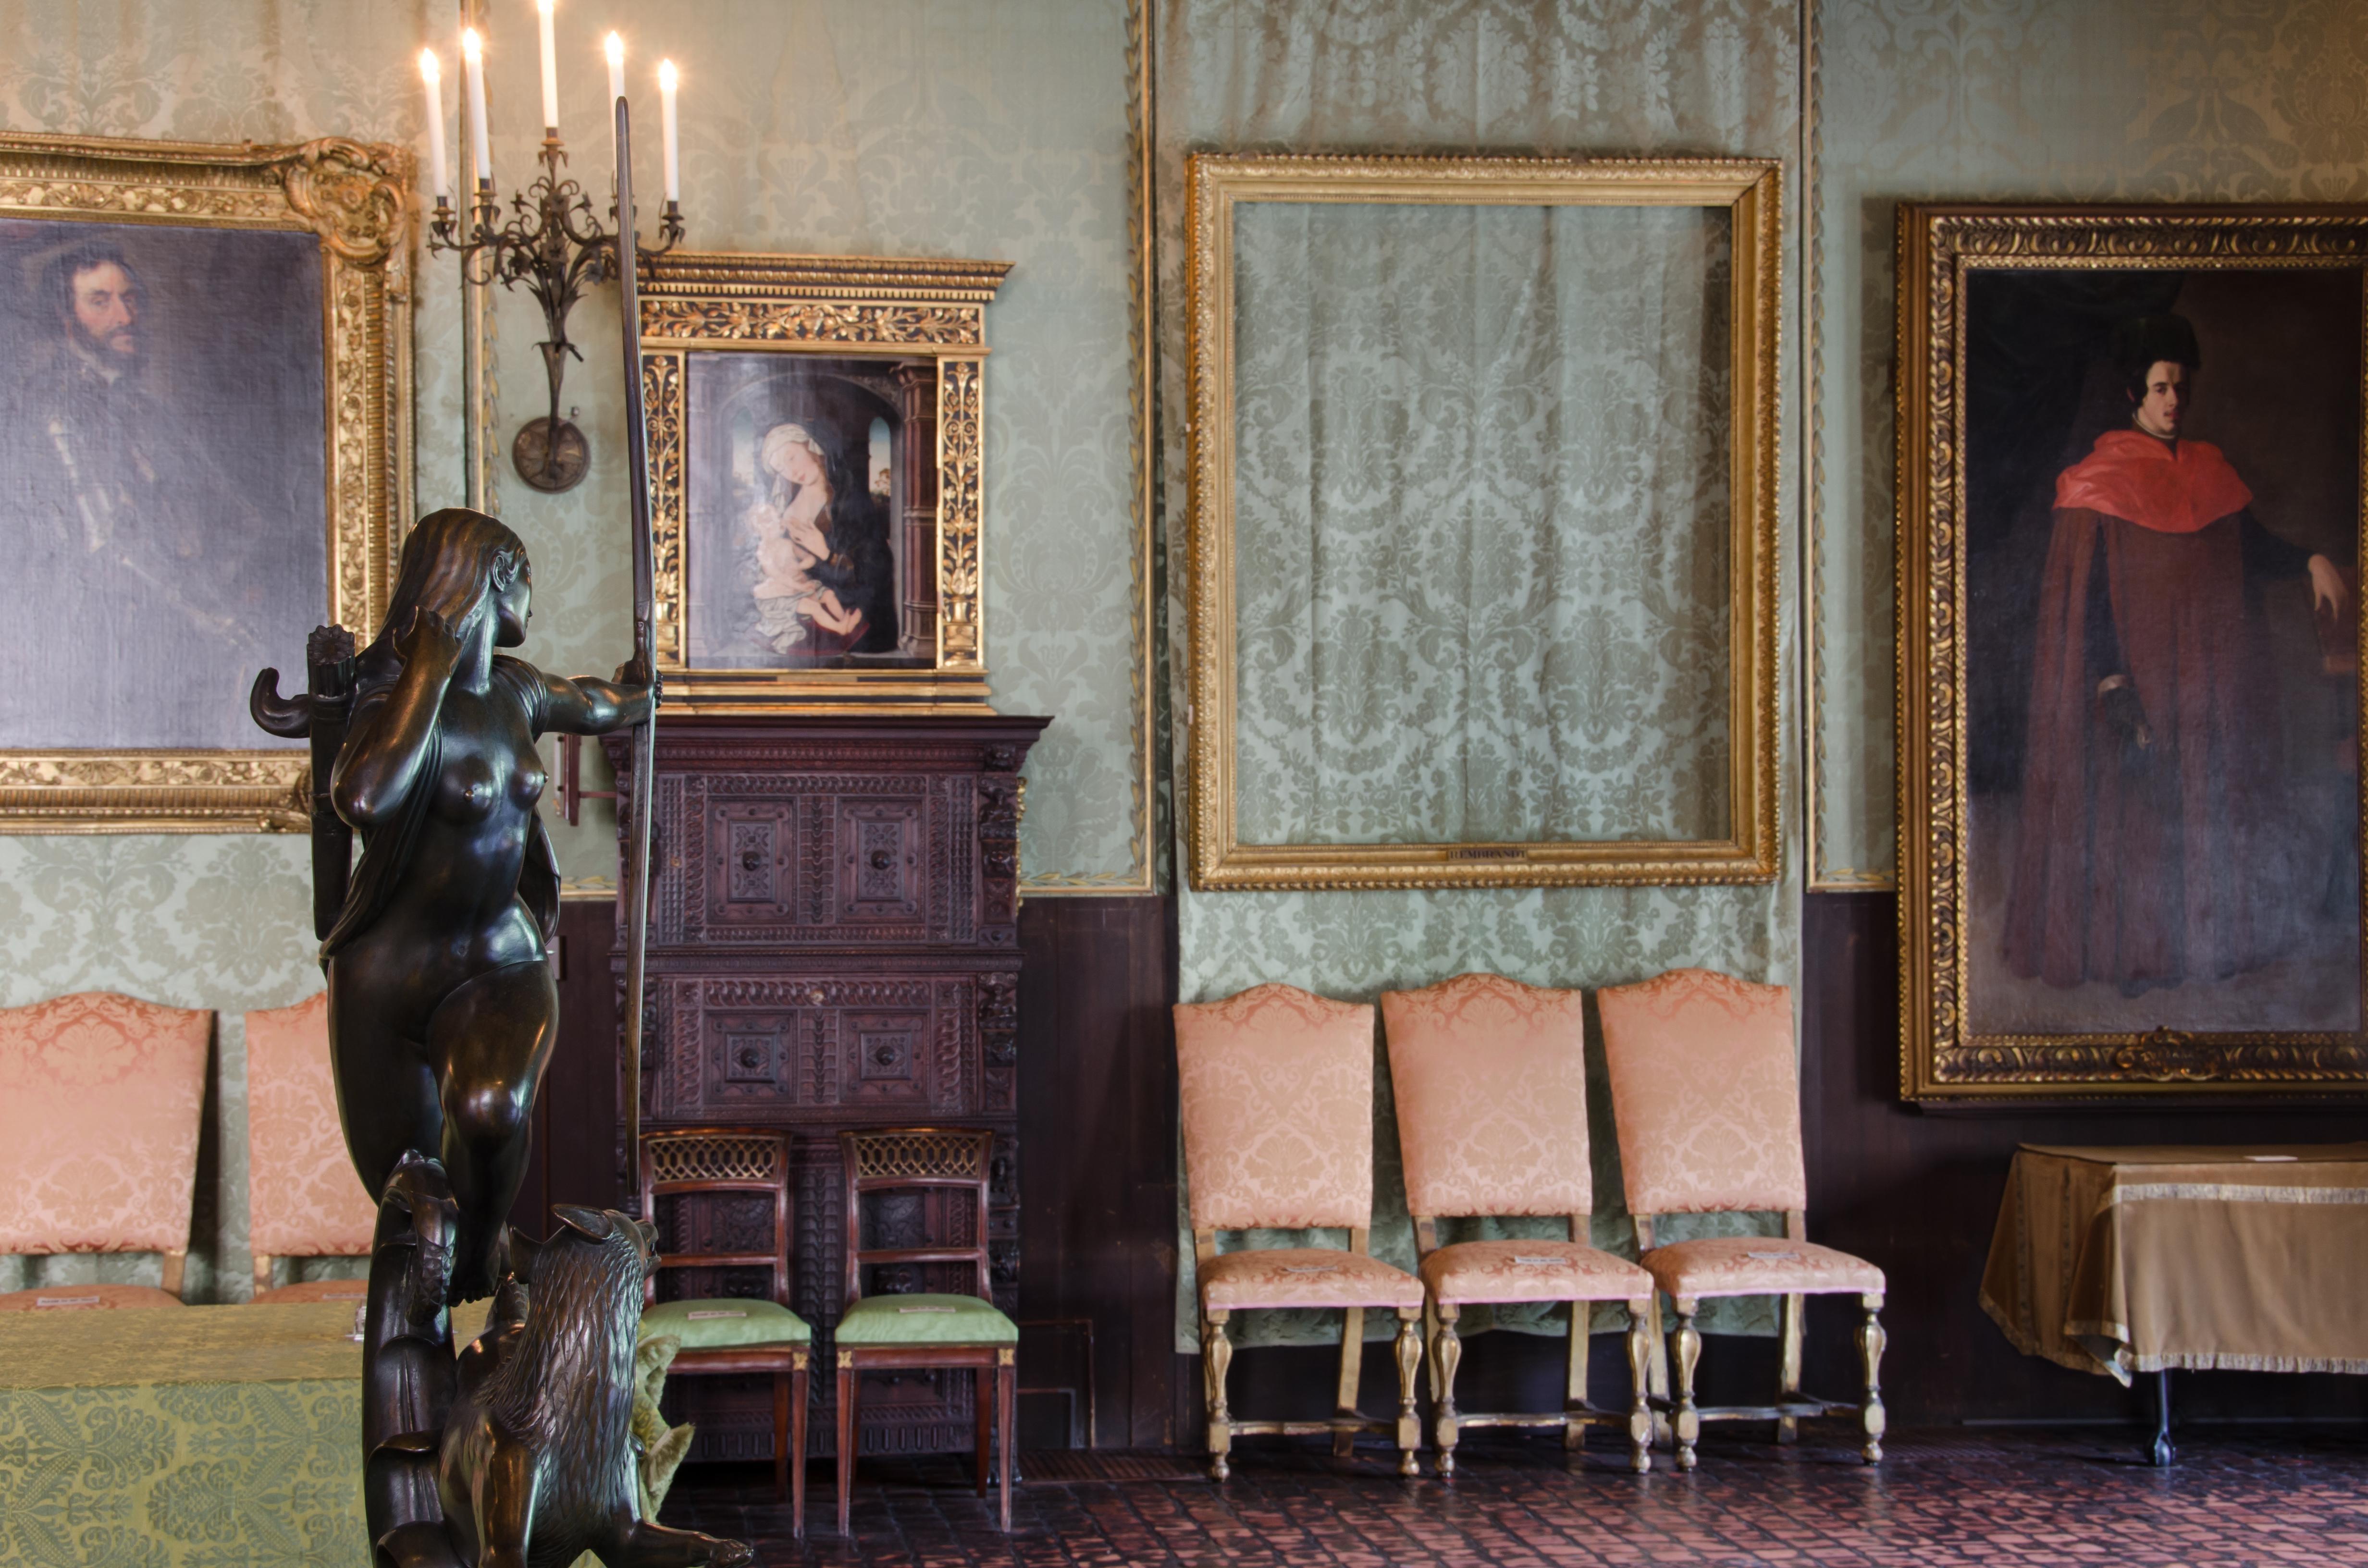 STOLEN PAINTINGS; EMPTY FRAMES; ISABELLA STEWART GARDNER MUSEUM